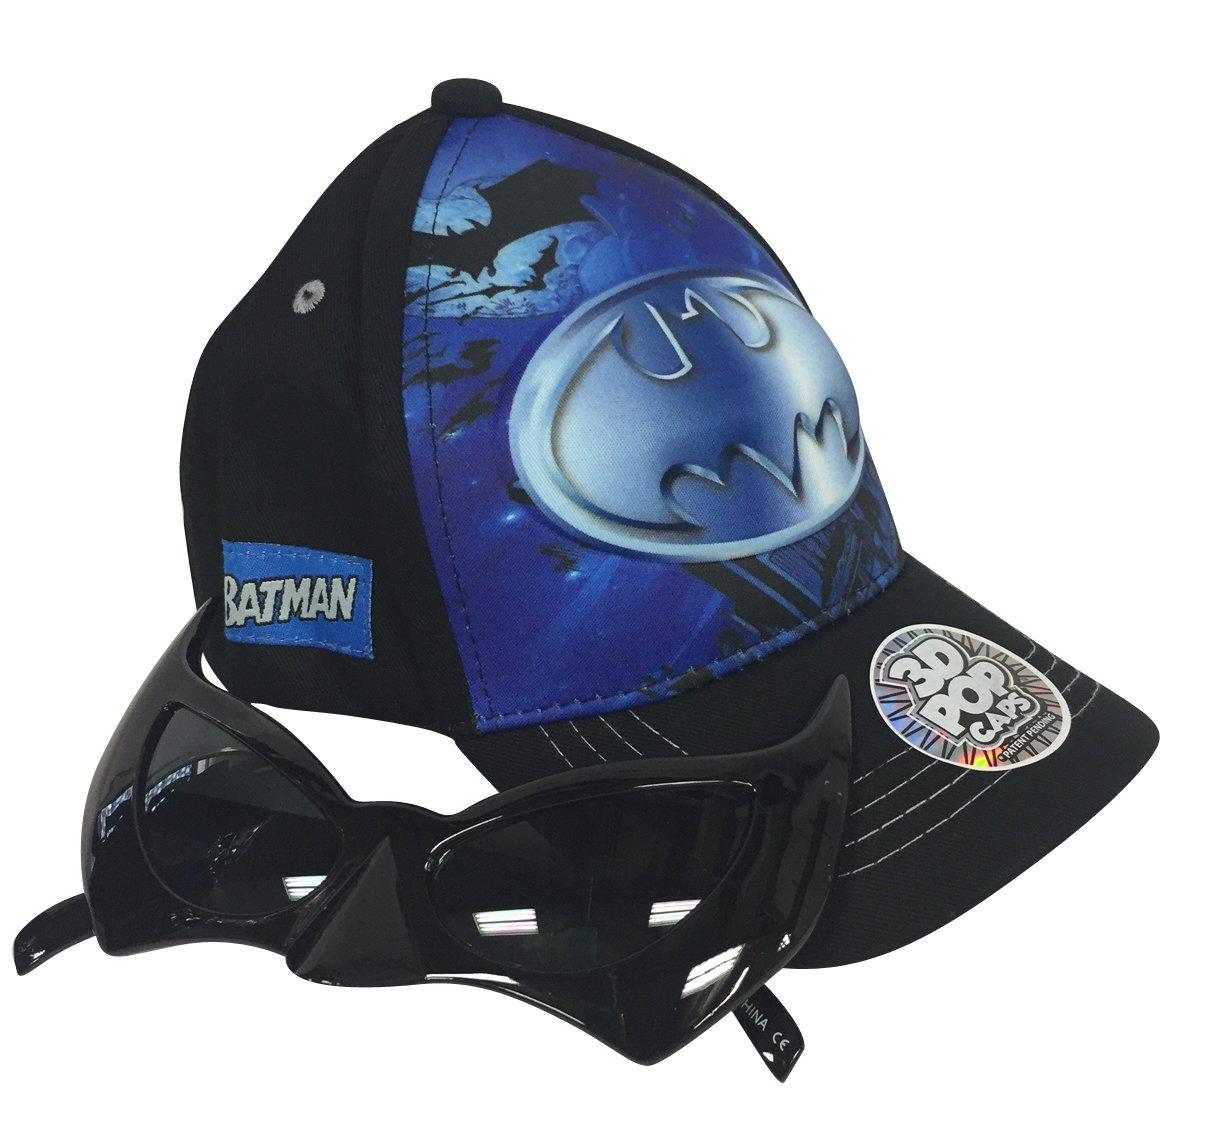 Batman 3D Pop up Adjustable Baseball Cap and Batman Sunglasses Set by Colorful Items